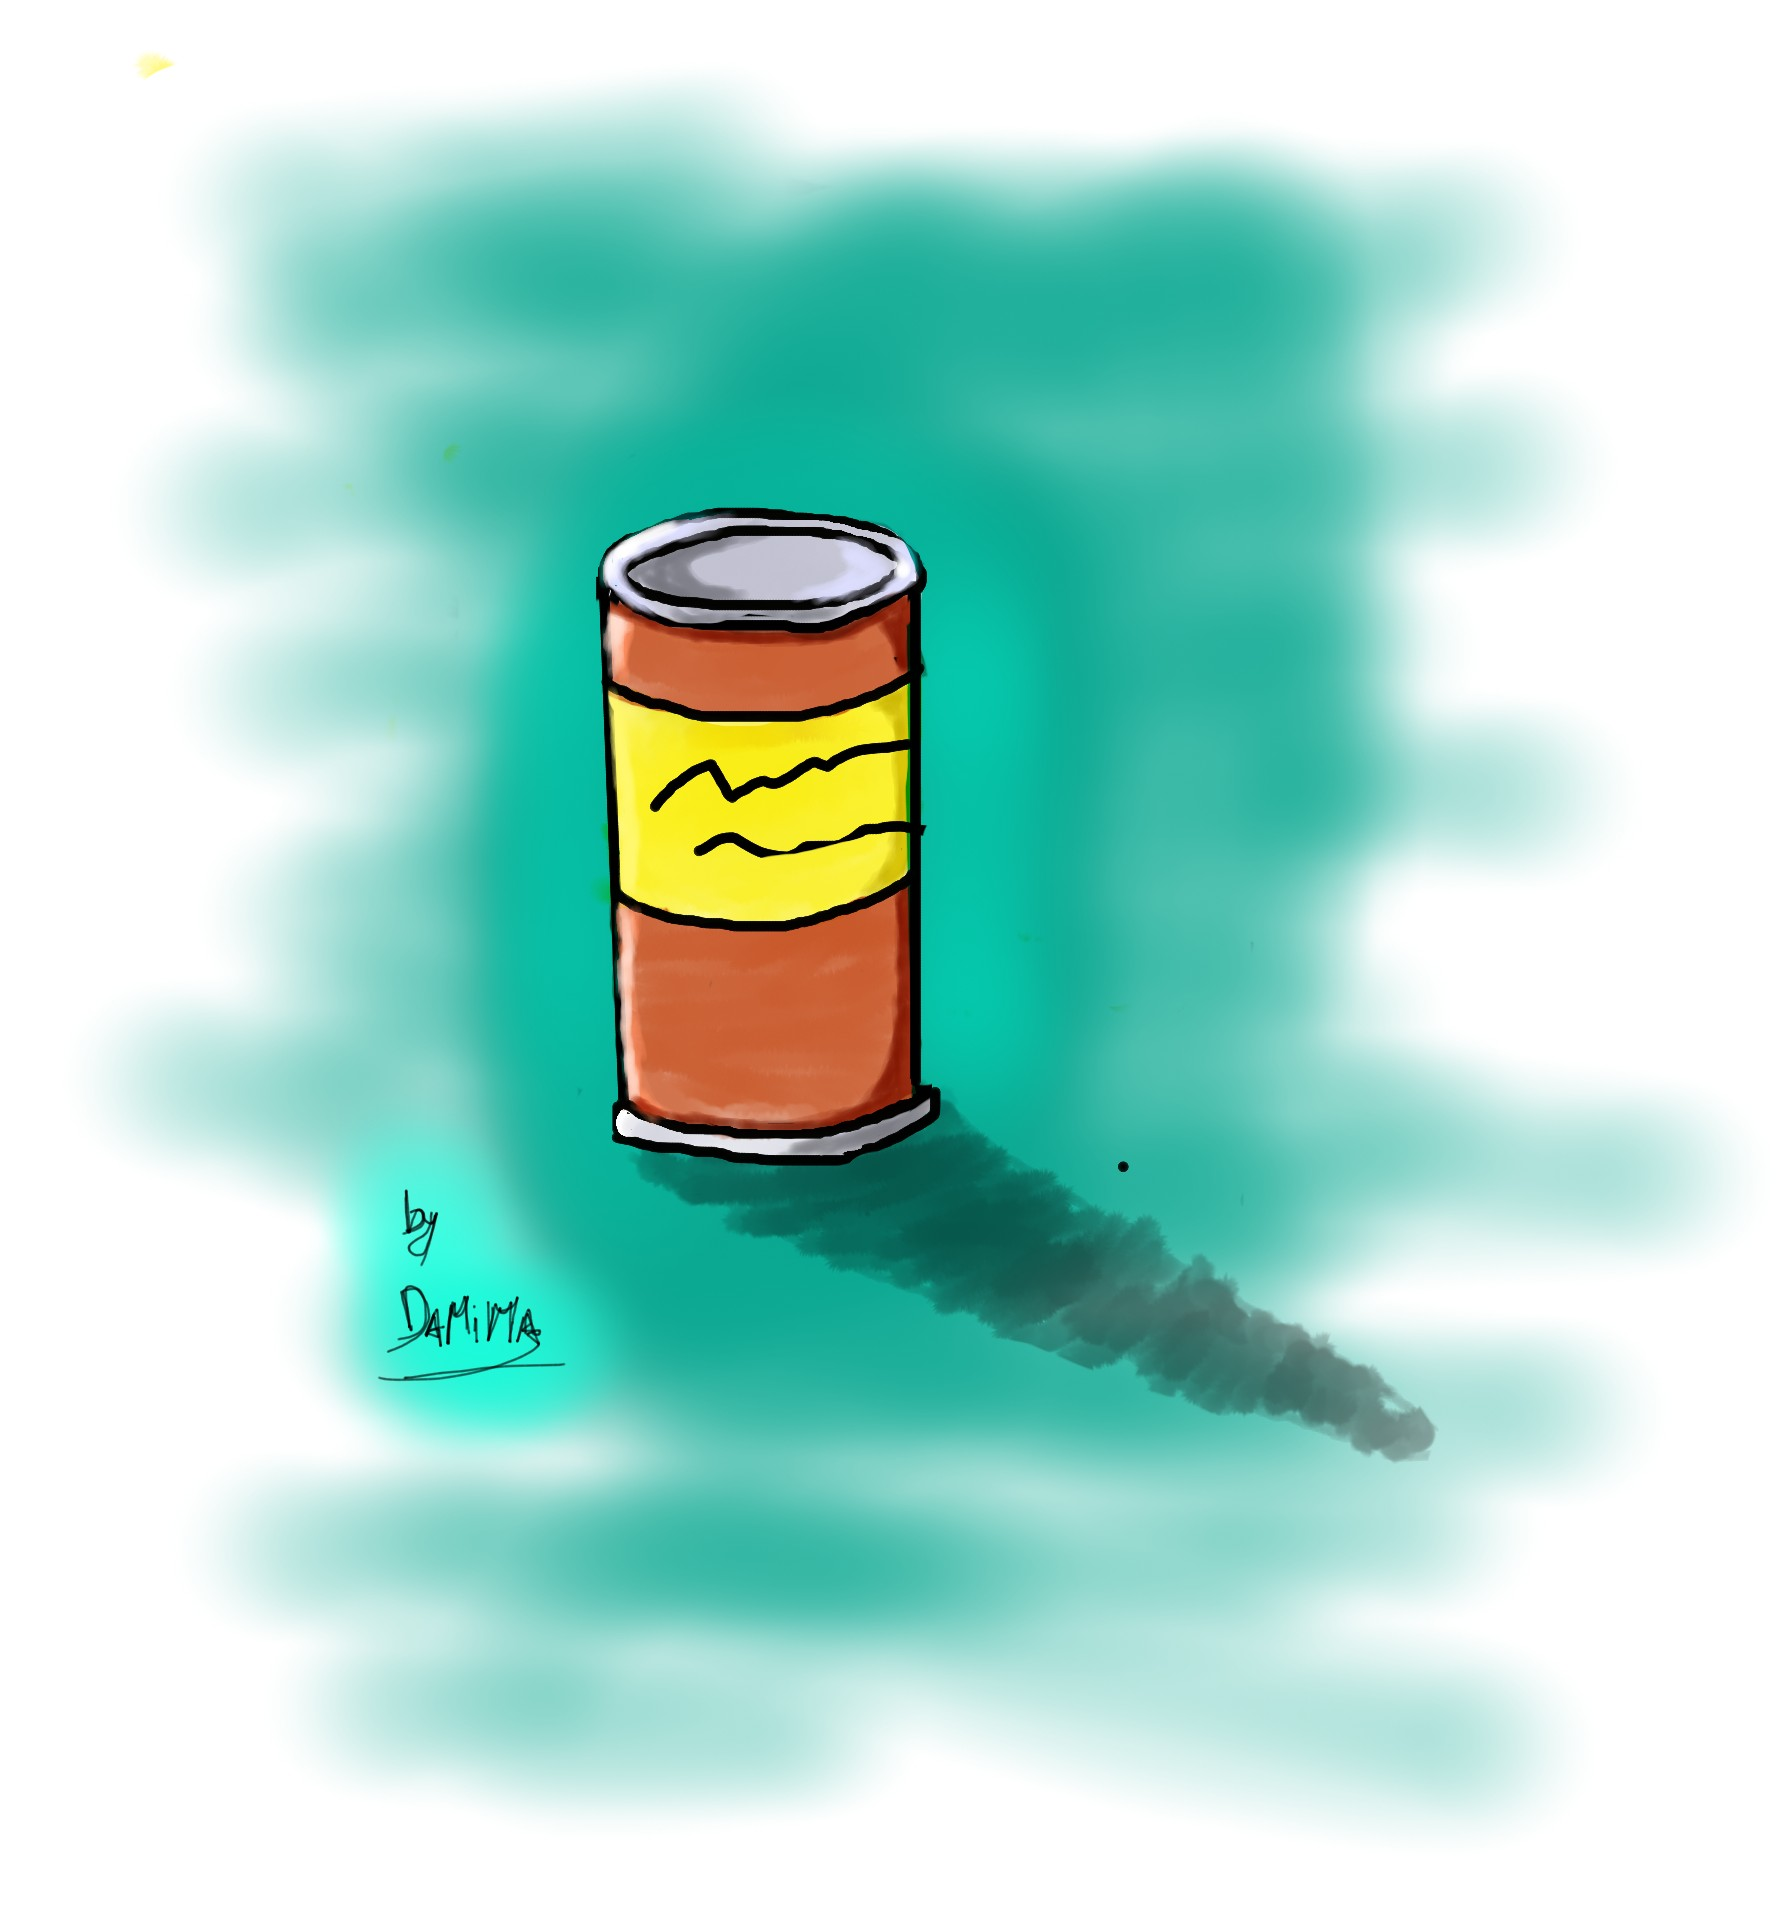 RANDOM CAN